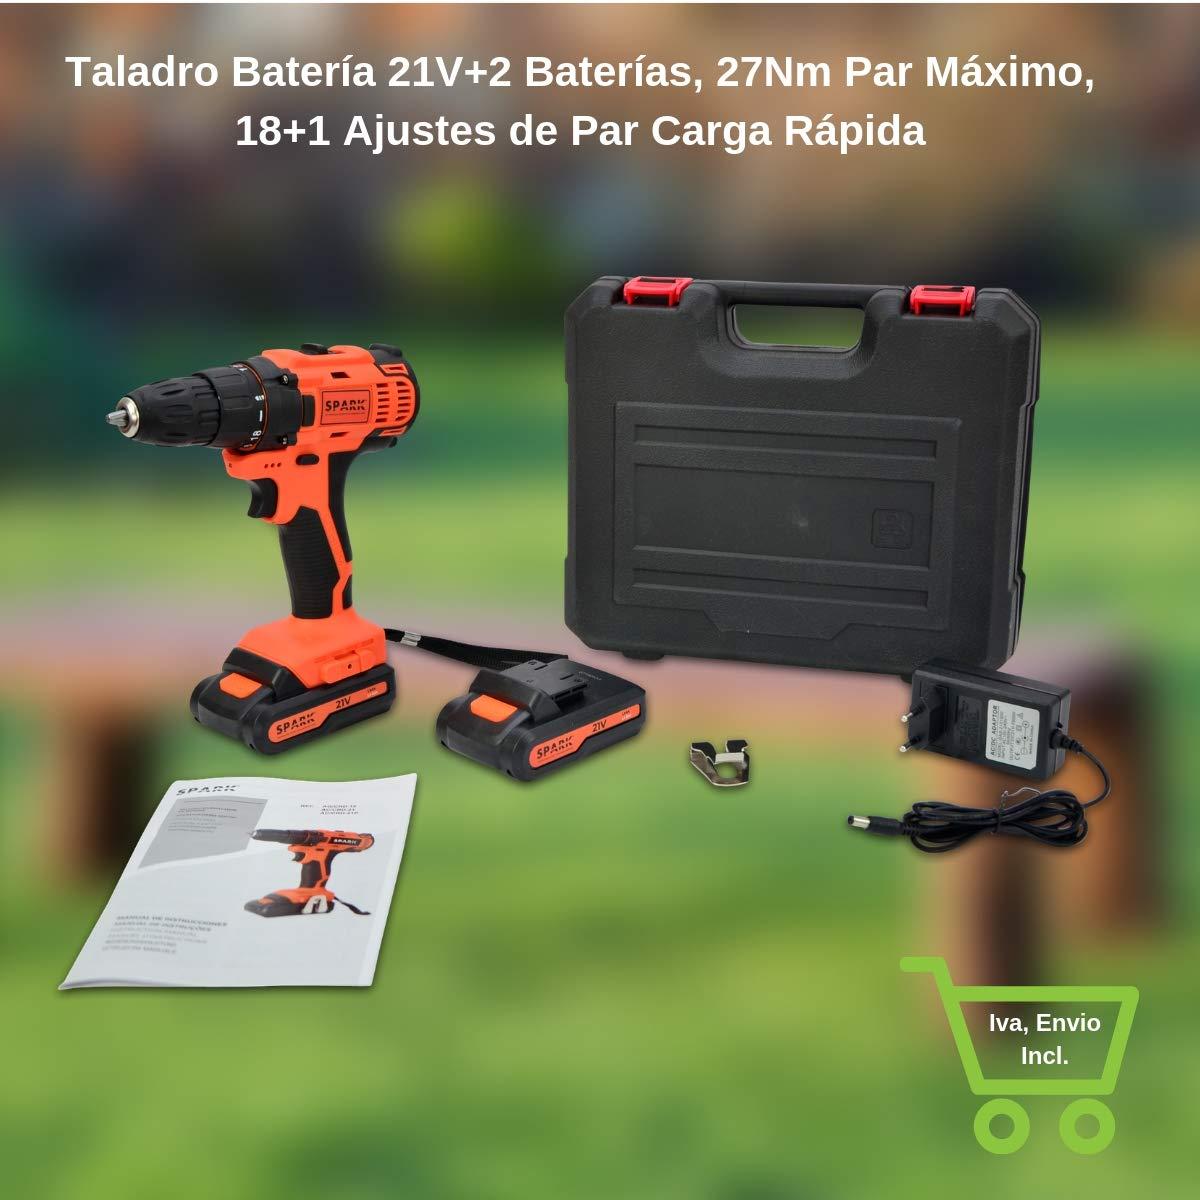 Taladro Batería 21V+2 Baterías, Taladro Atornillador 27Nm Par Máximo, Destornillador Eléctrico 18+1 Ajustes de Par Carga Rápida